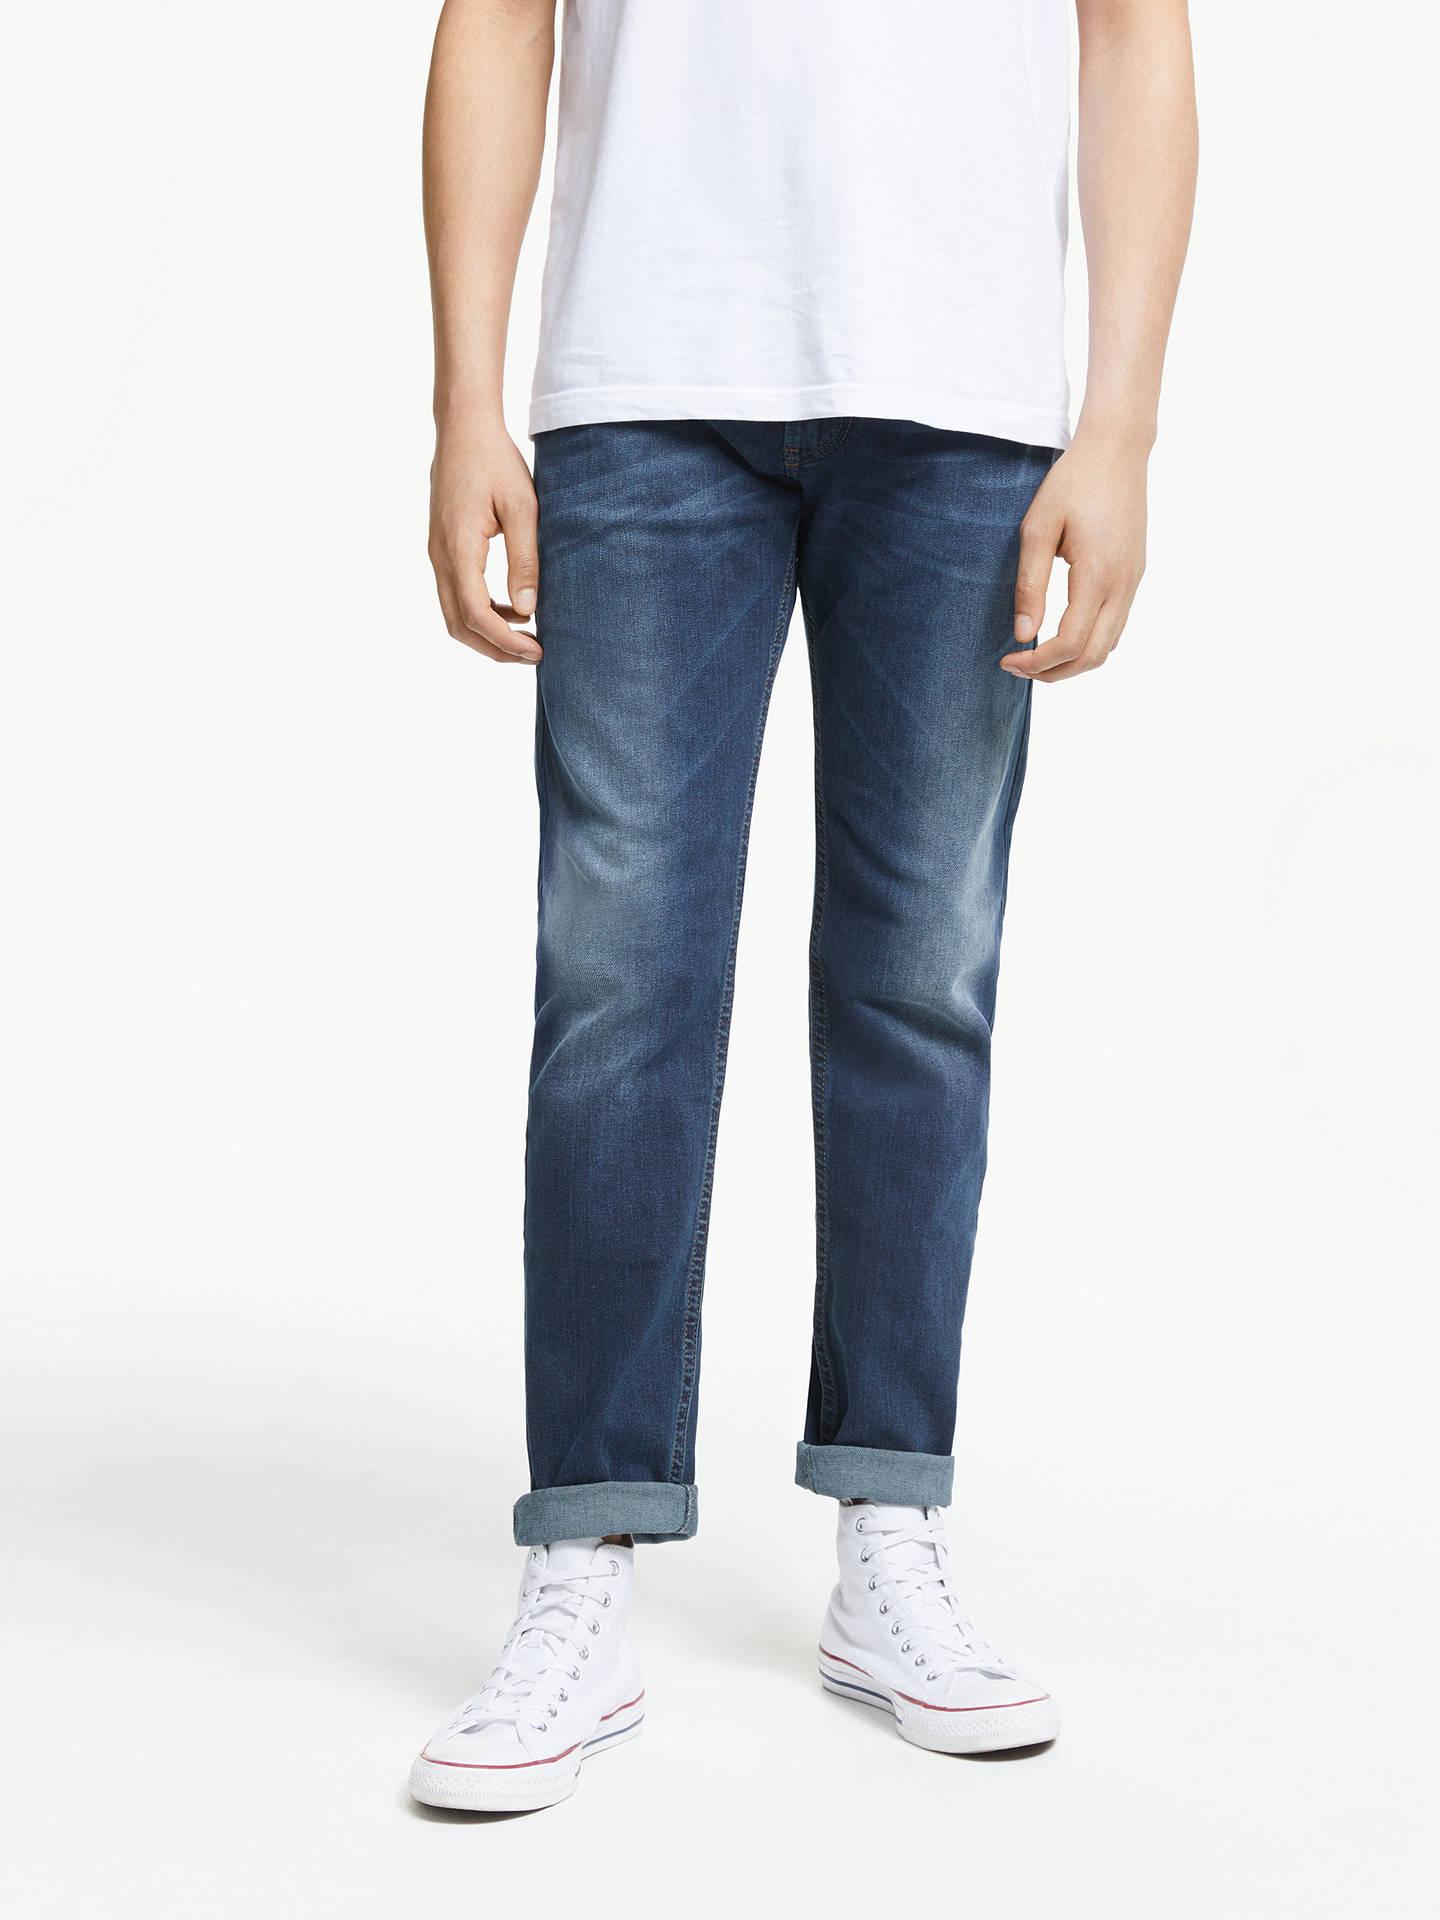 dc5de1a5b3b Buy Diesel Thommer Slim Fit Stretch Jeans